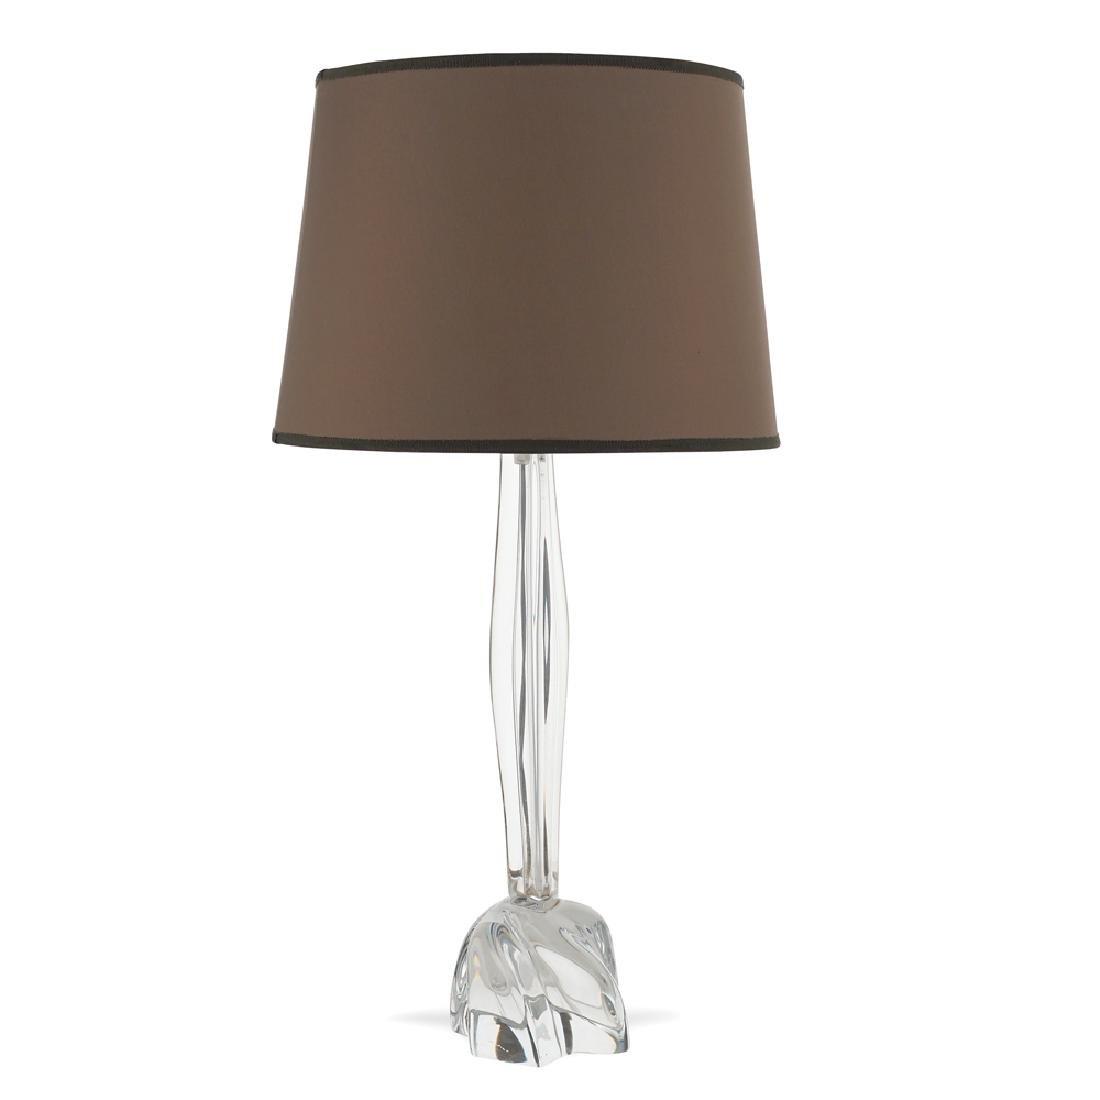 Daum table lamp France 20th century h. 58 cm.